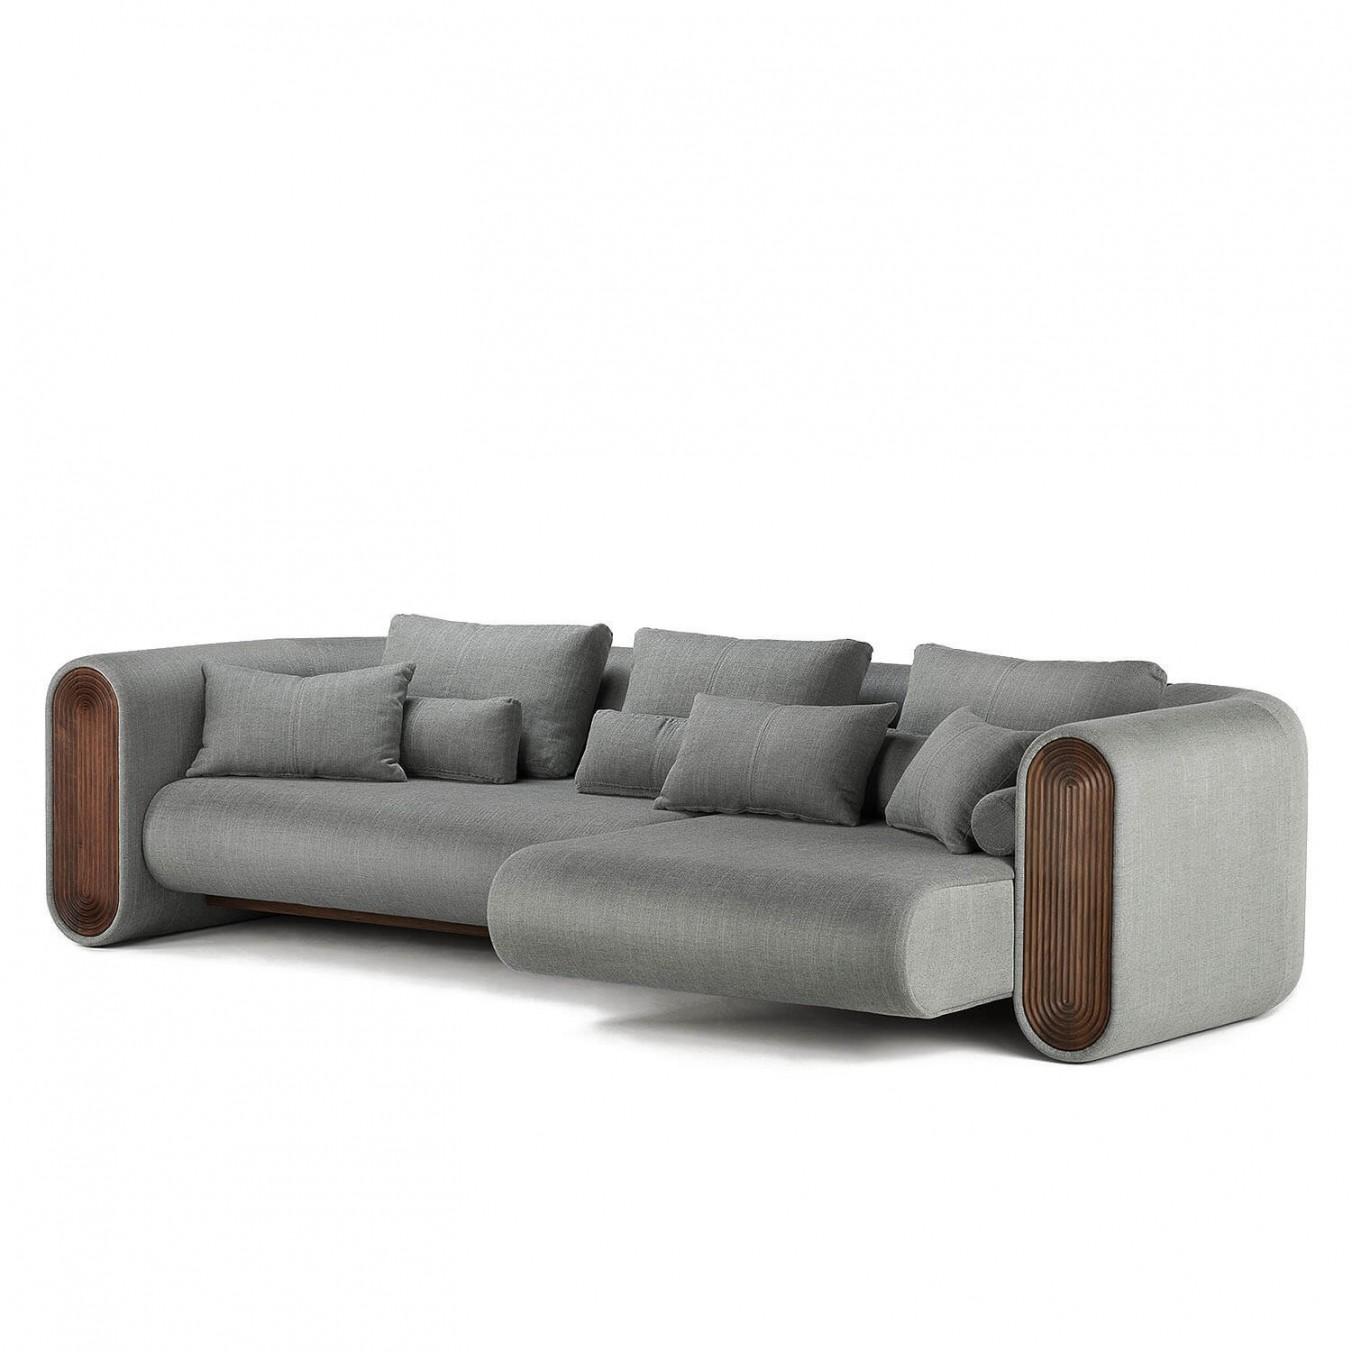 corner unit sofas south africa leather l shaped sofa uk grey baci living room